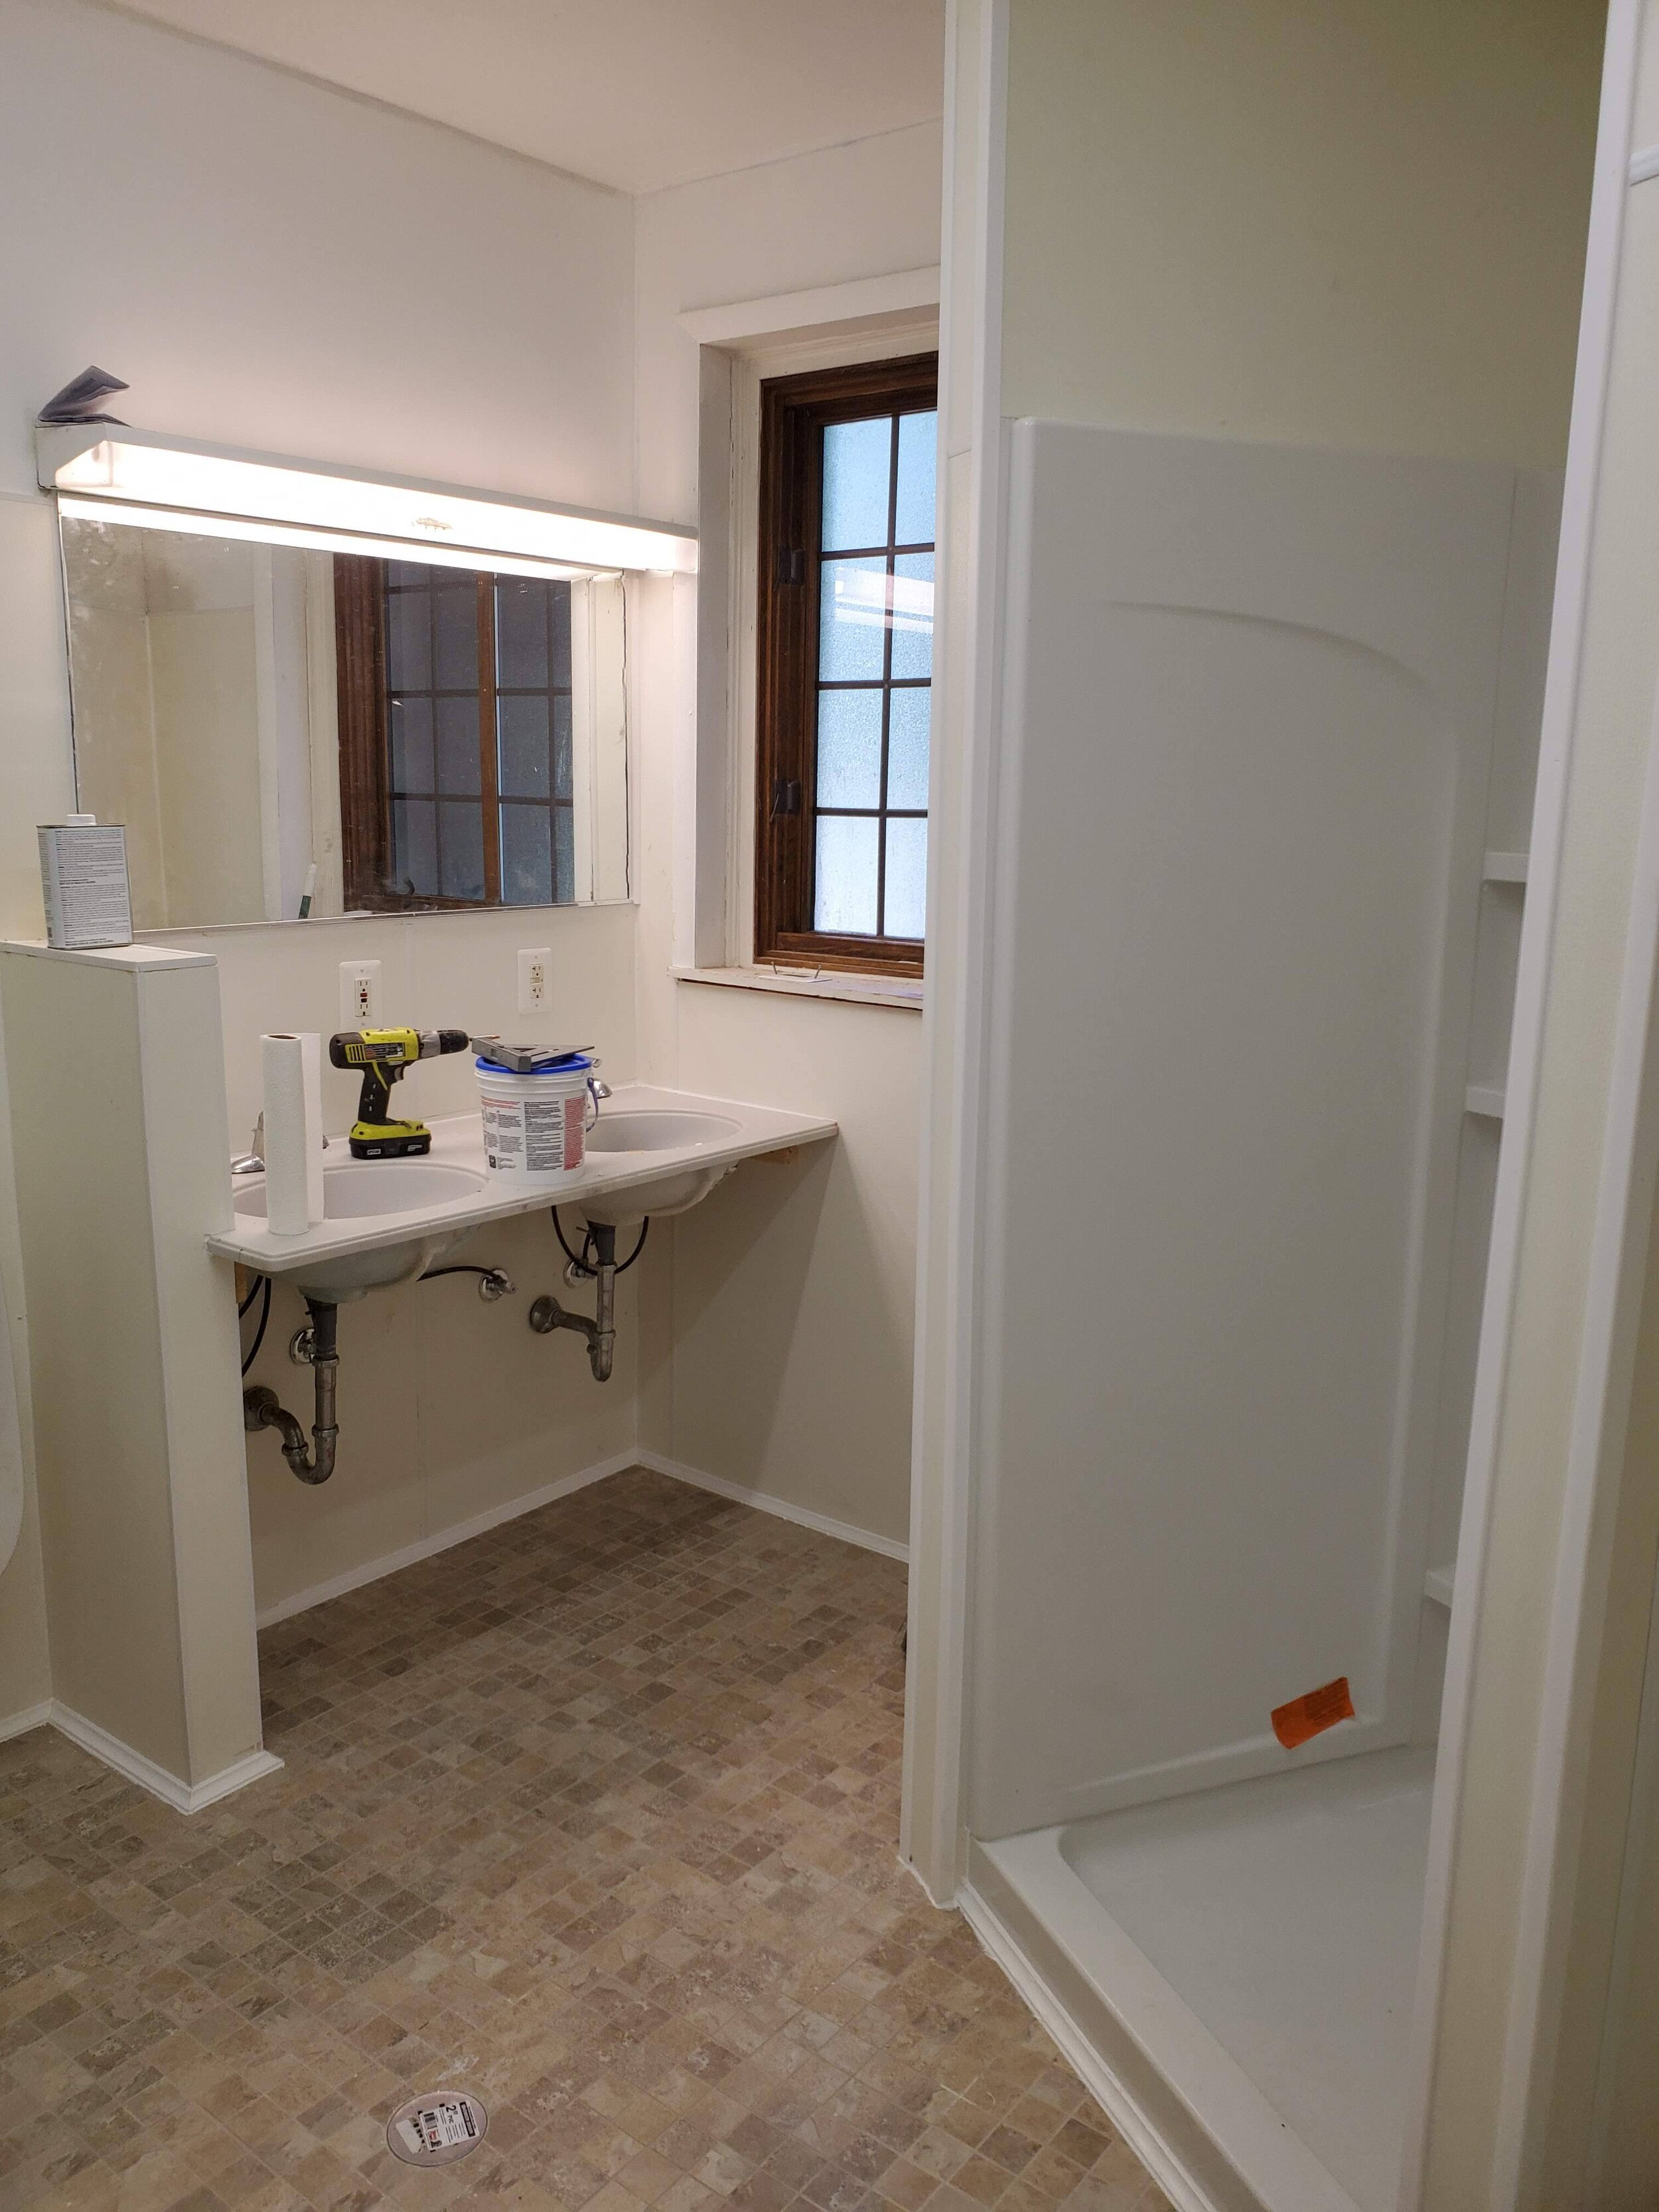 2019 First Floor Bathroom Renovation 20190818_111041.jpg